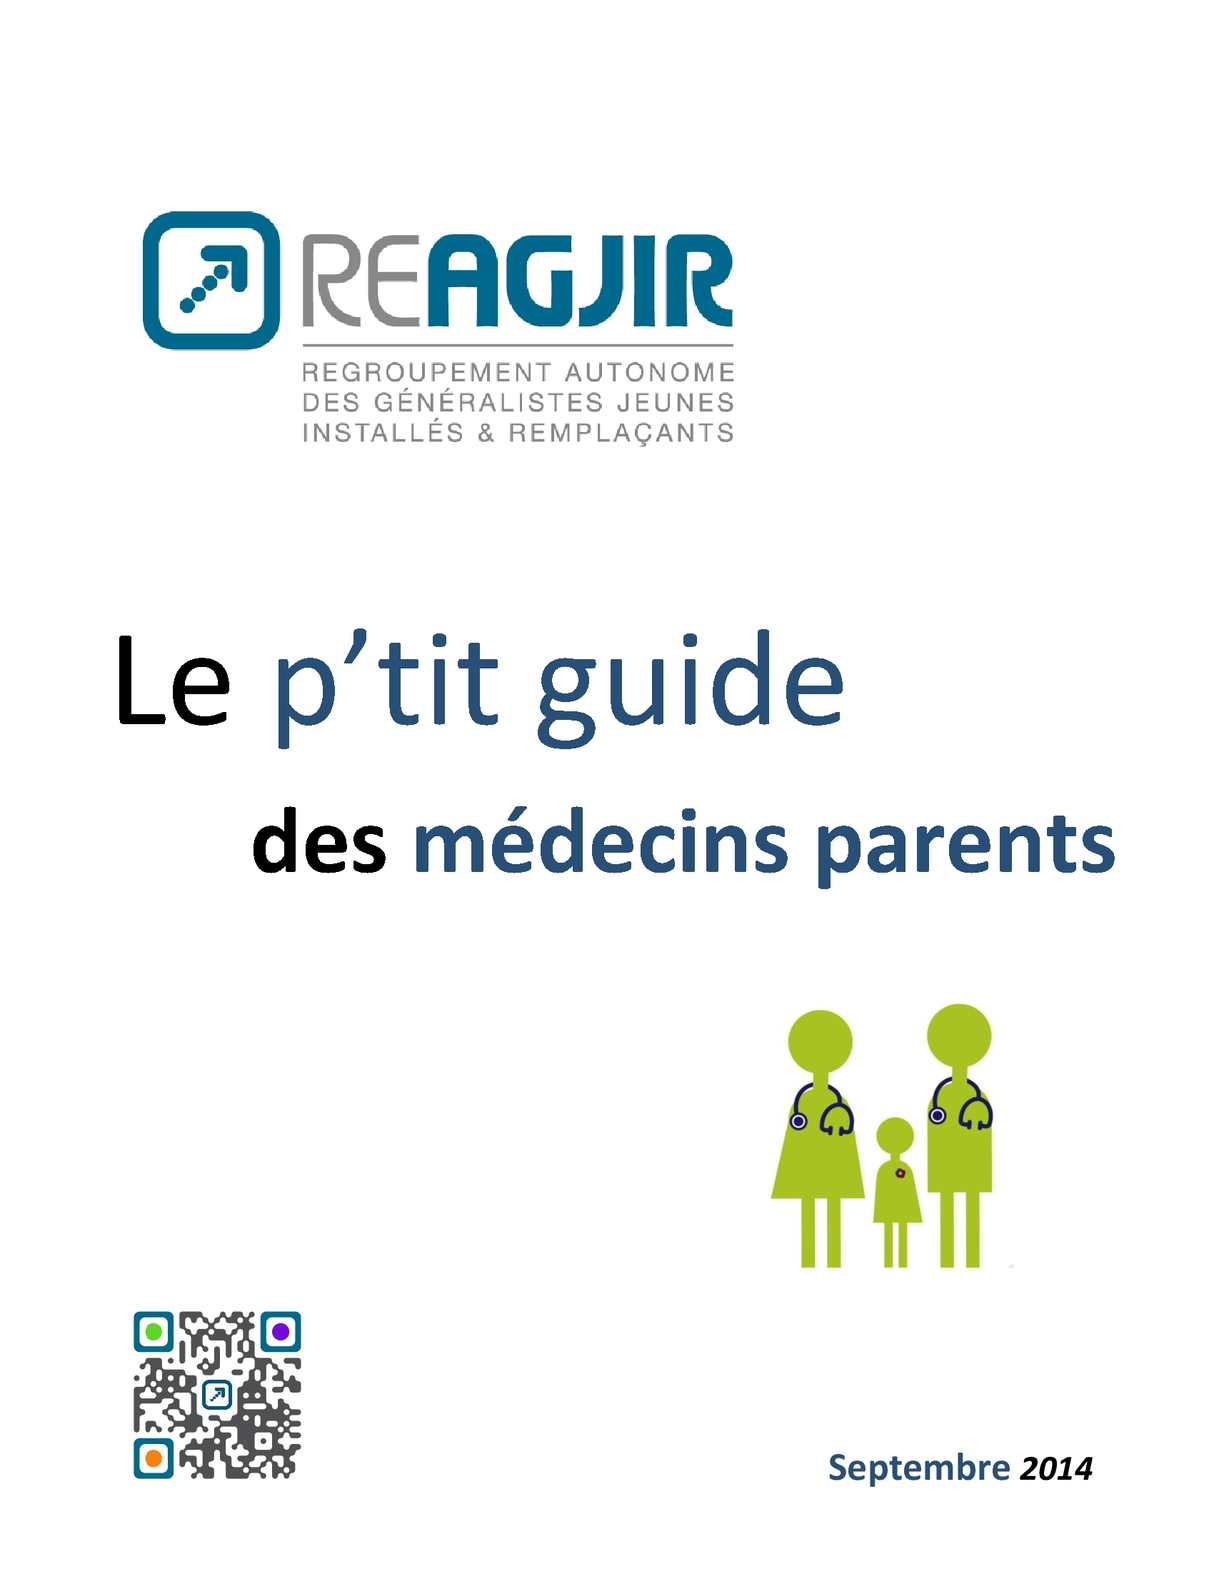 Calameo Reagjir Ptit Guide De La Parentalite